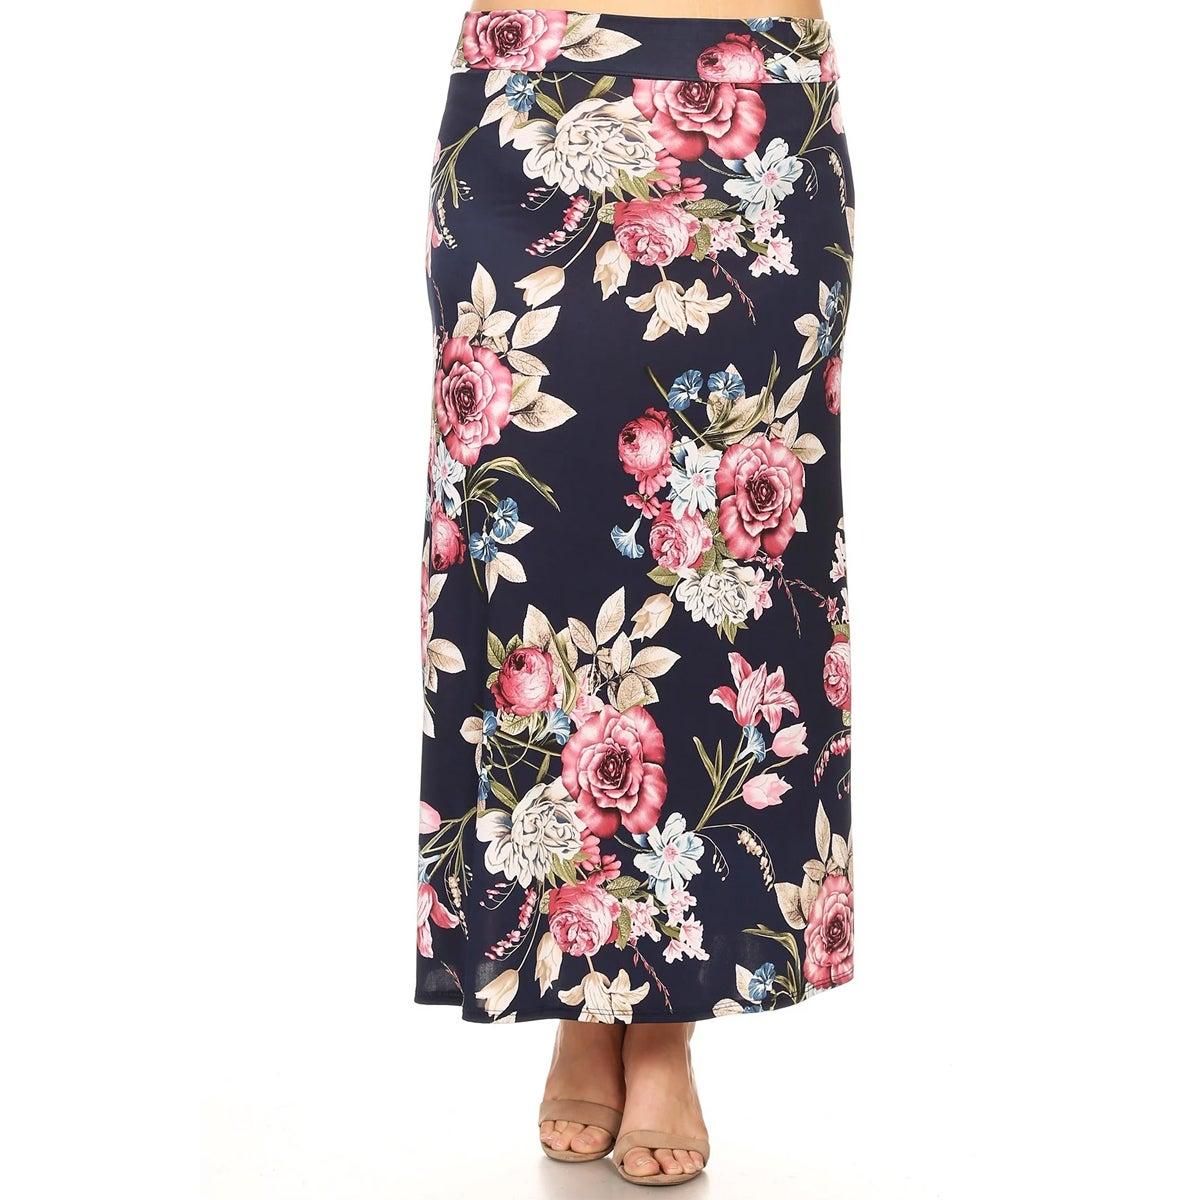 15b1346f86cd Shop Women's Plus Size Navy Floral Maxi Skirt - On Sale - Free ...